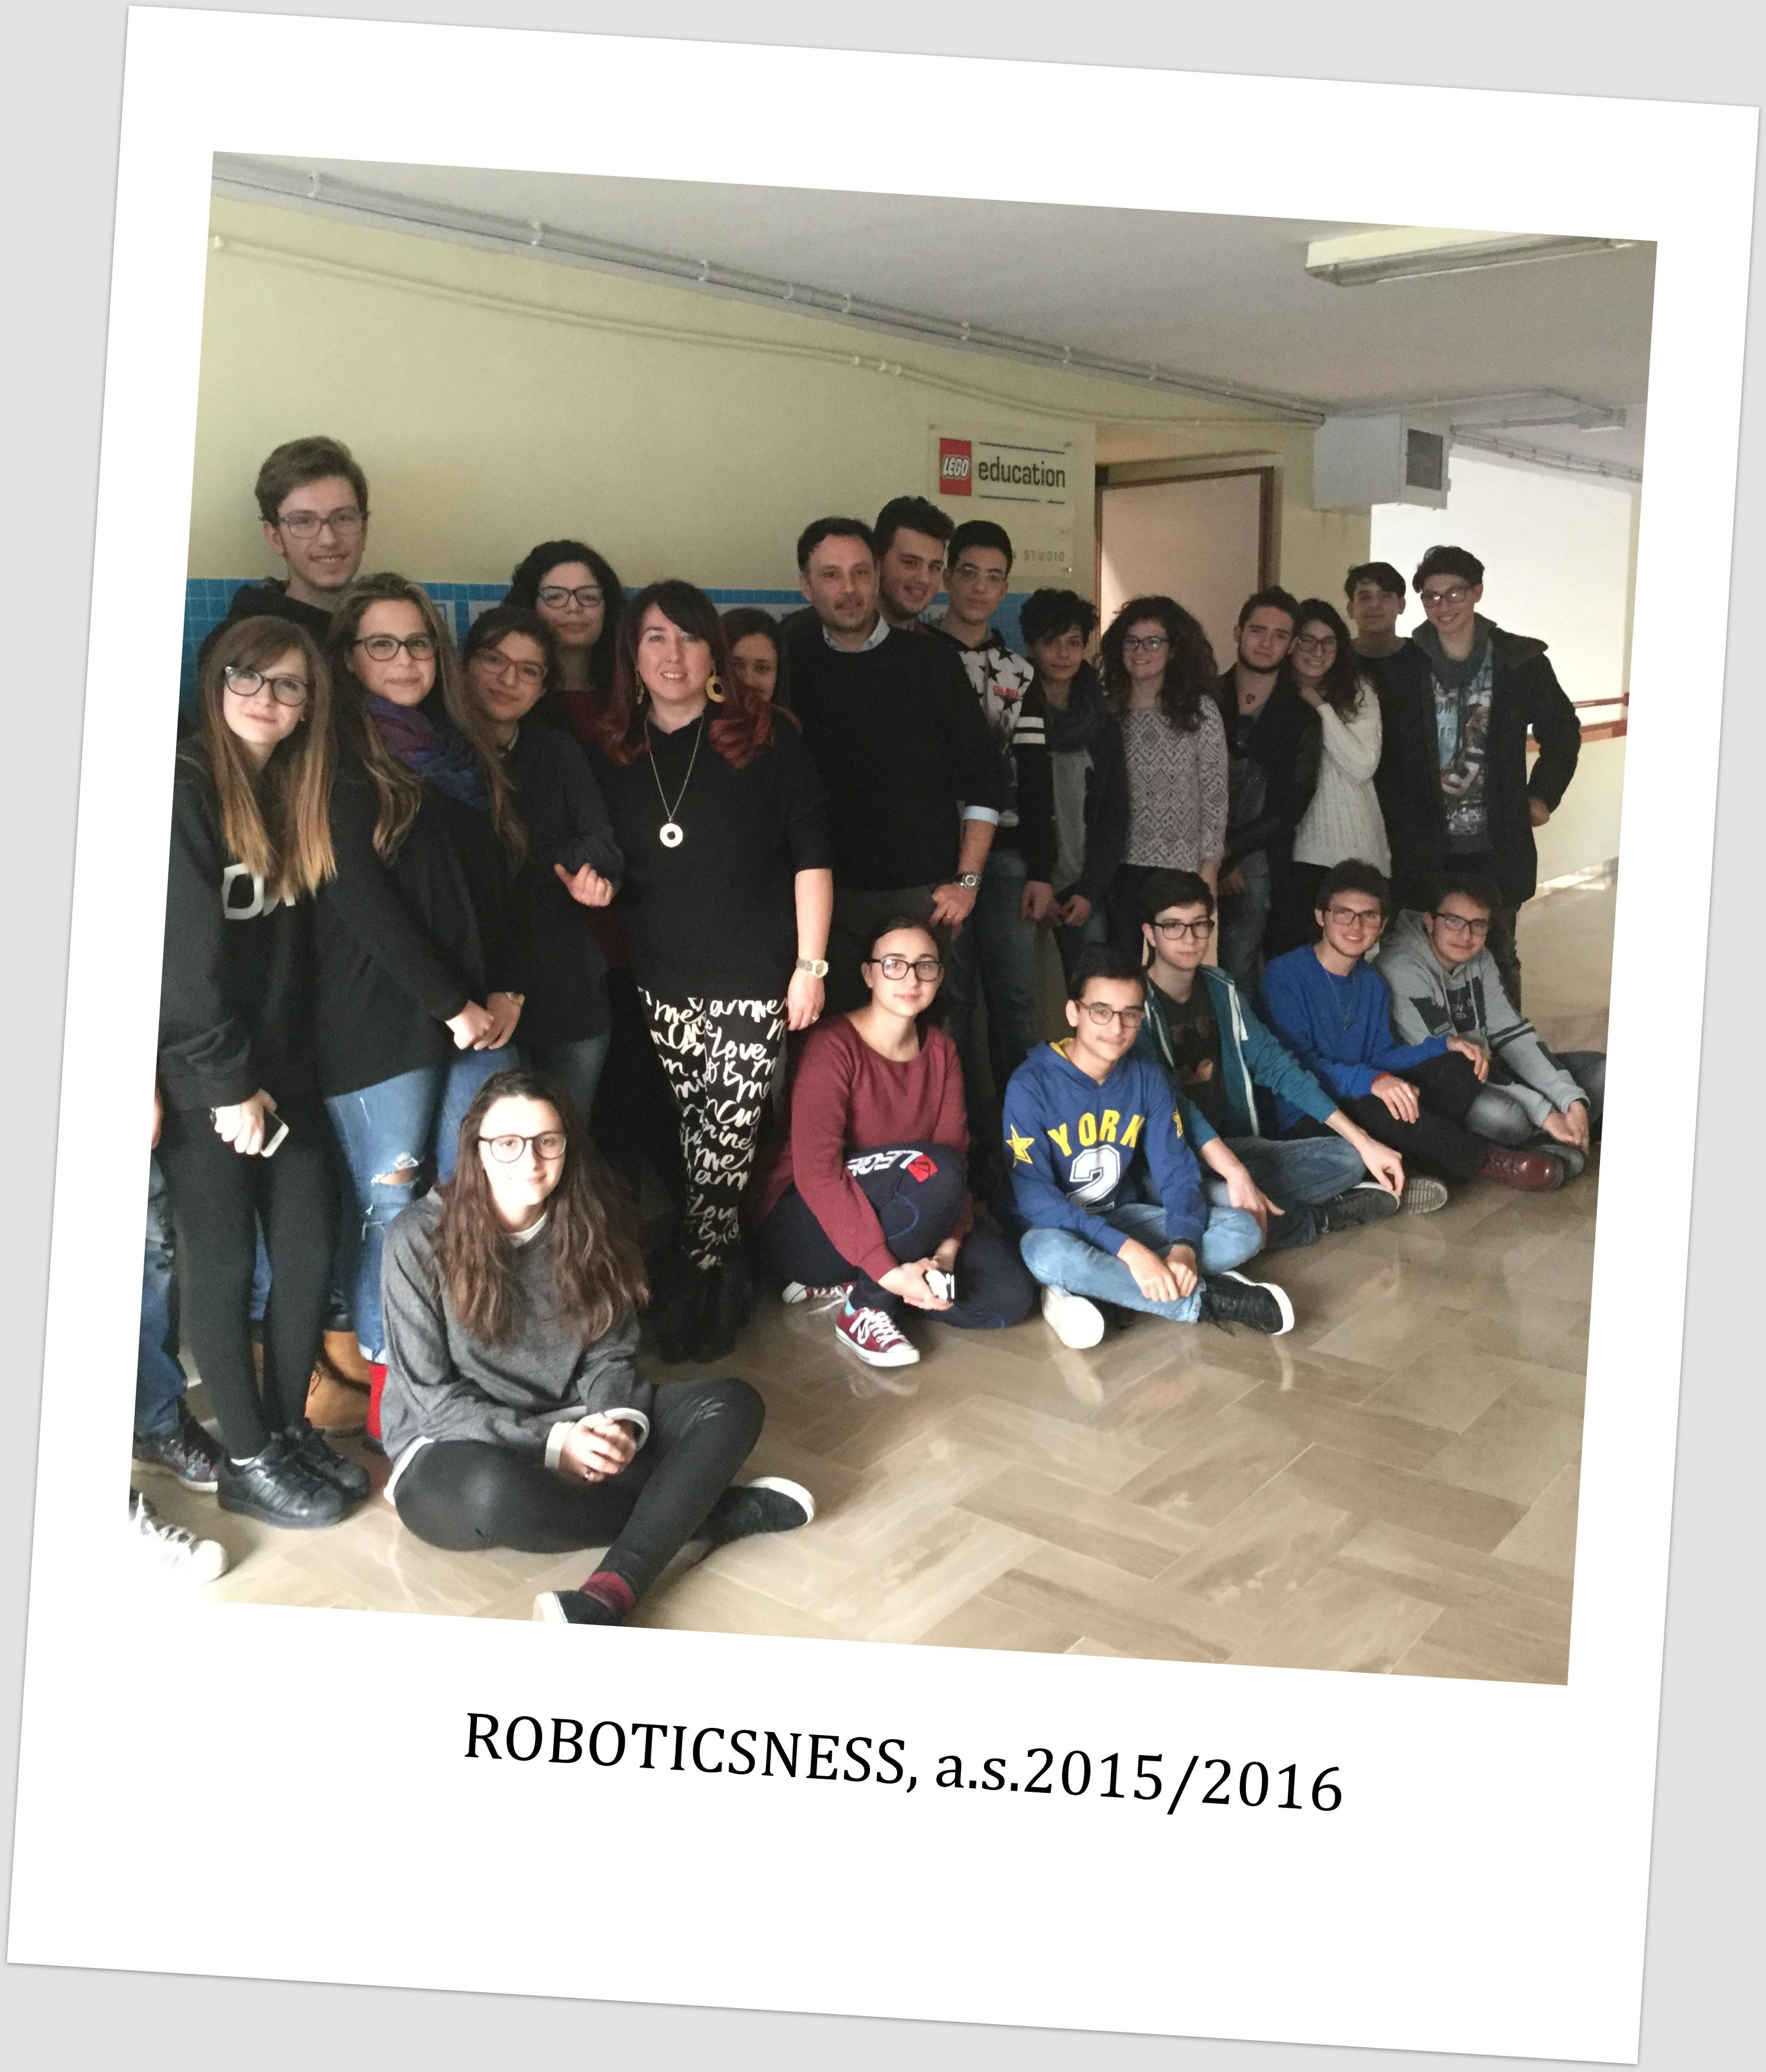 Roboticsness